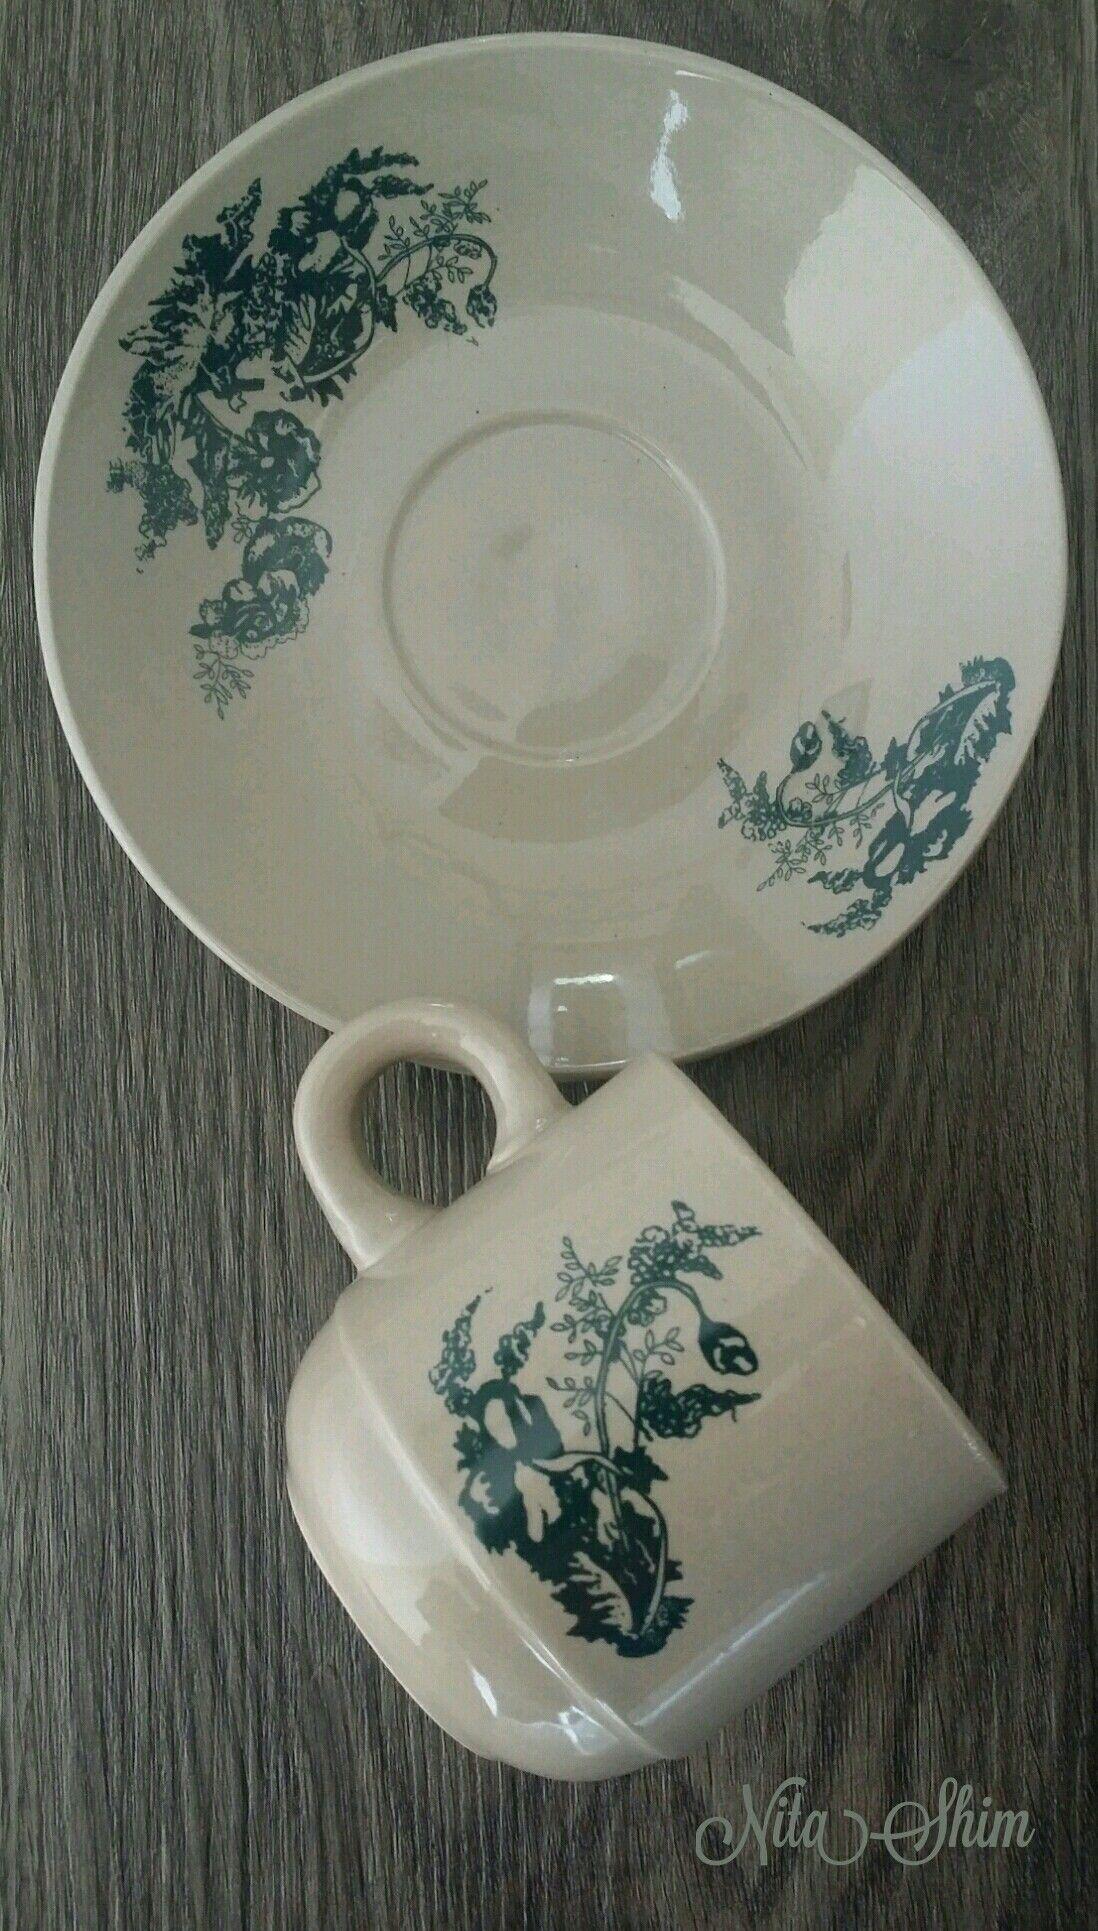 Vintage Oriental Kopitiam Cup And Saucer Cup And Saucer Tea Set Cup